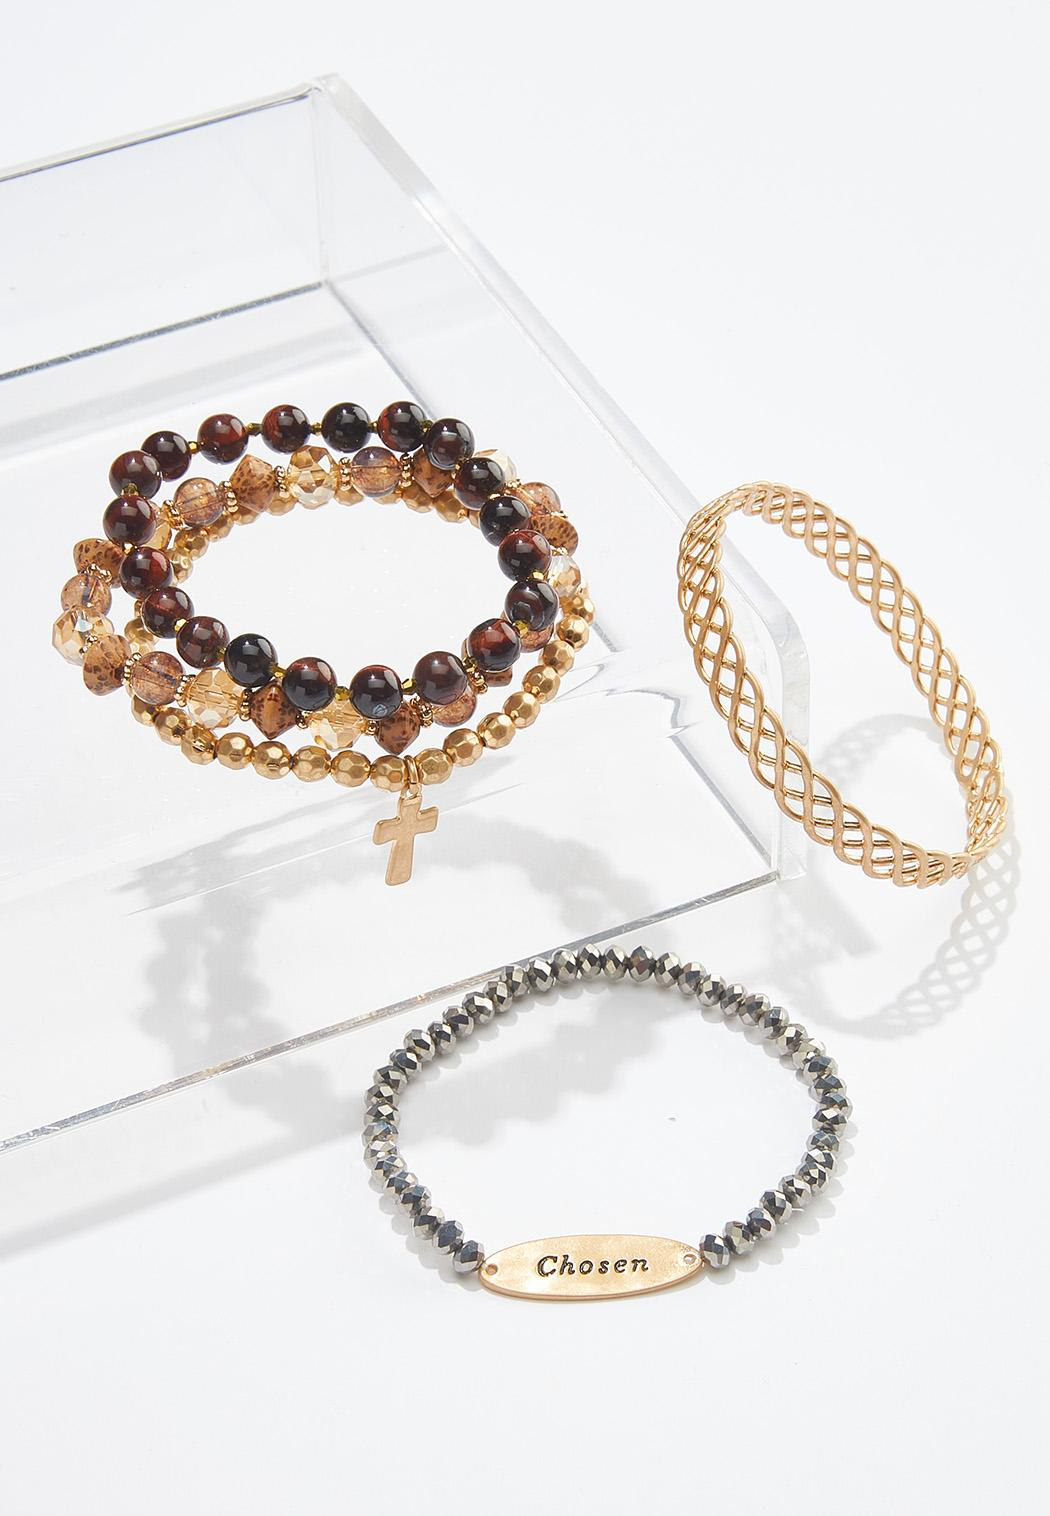 Chosen Inspirational Bracelet Set